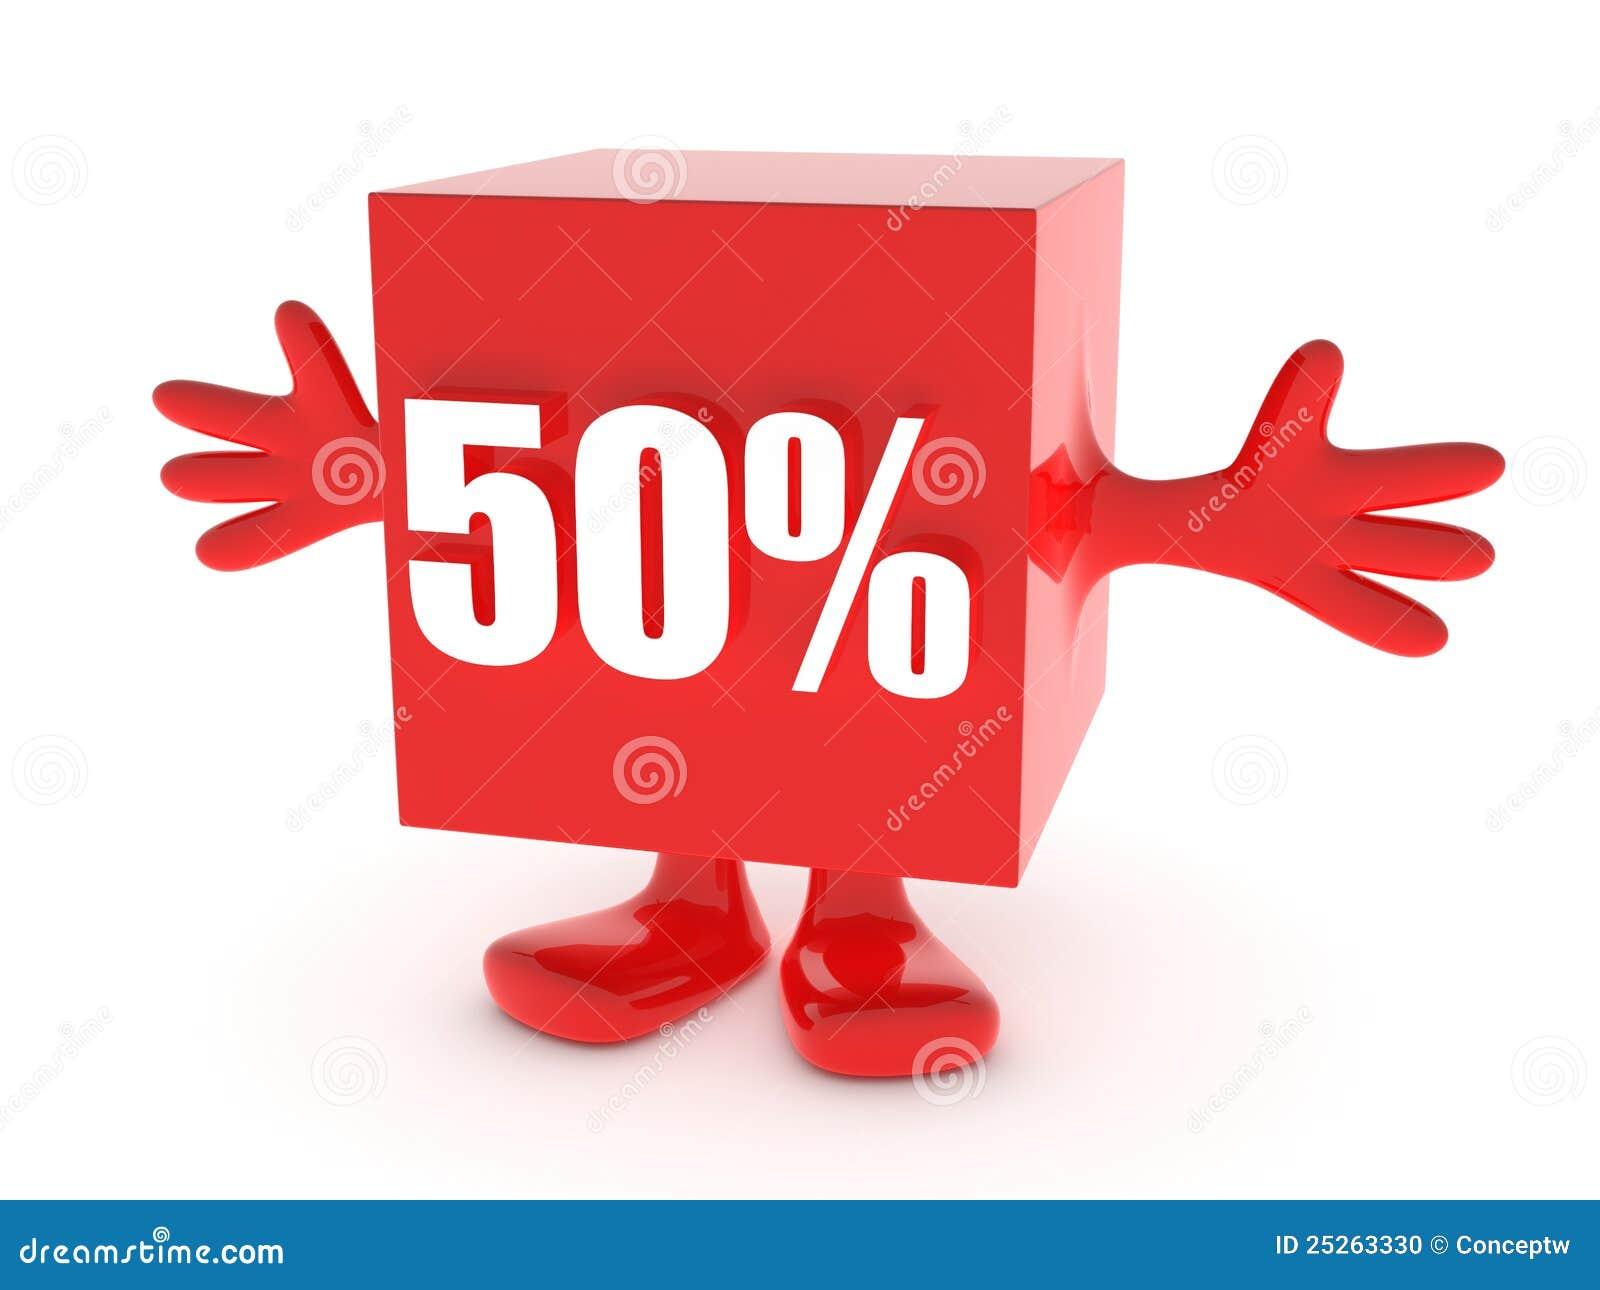 50 Percent Off Stock Photo Image 25263330